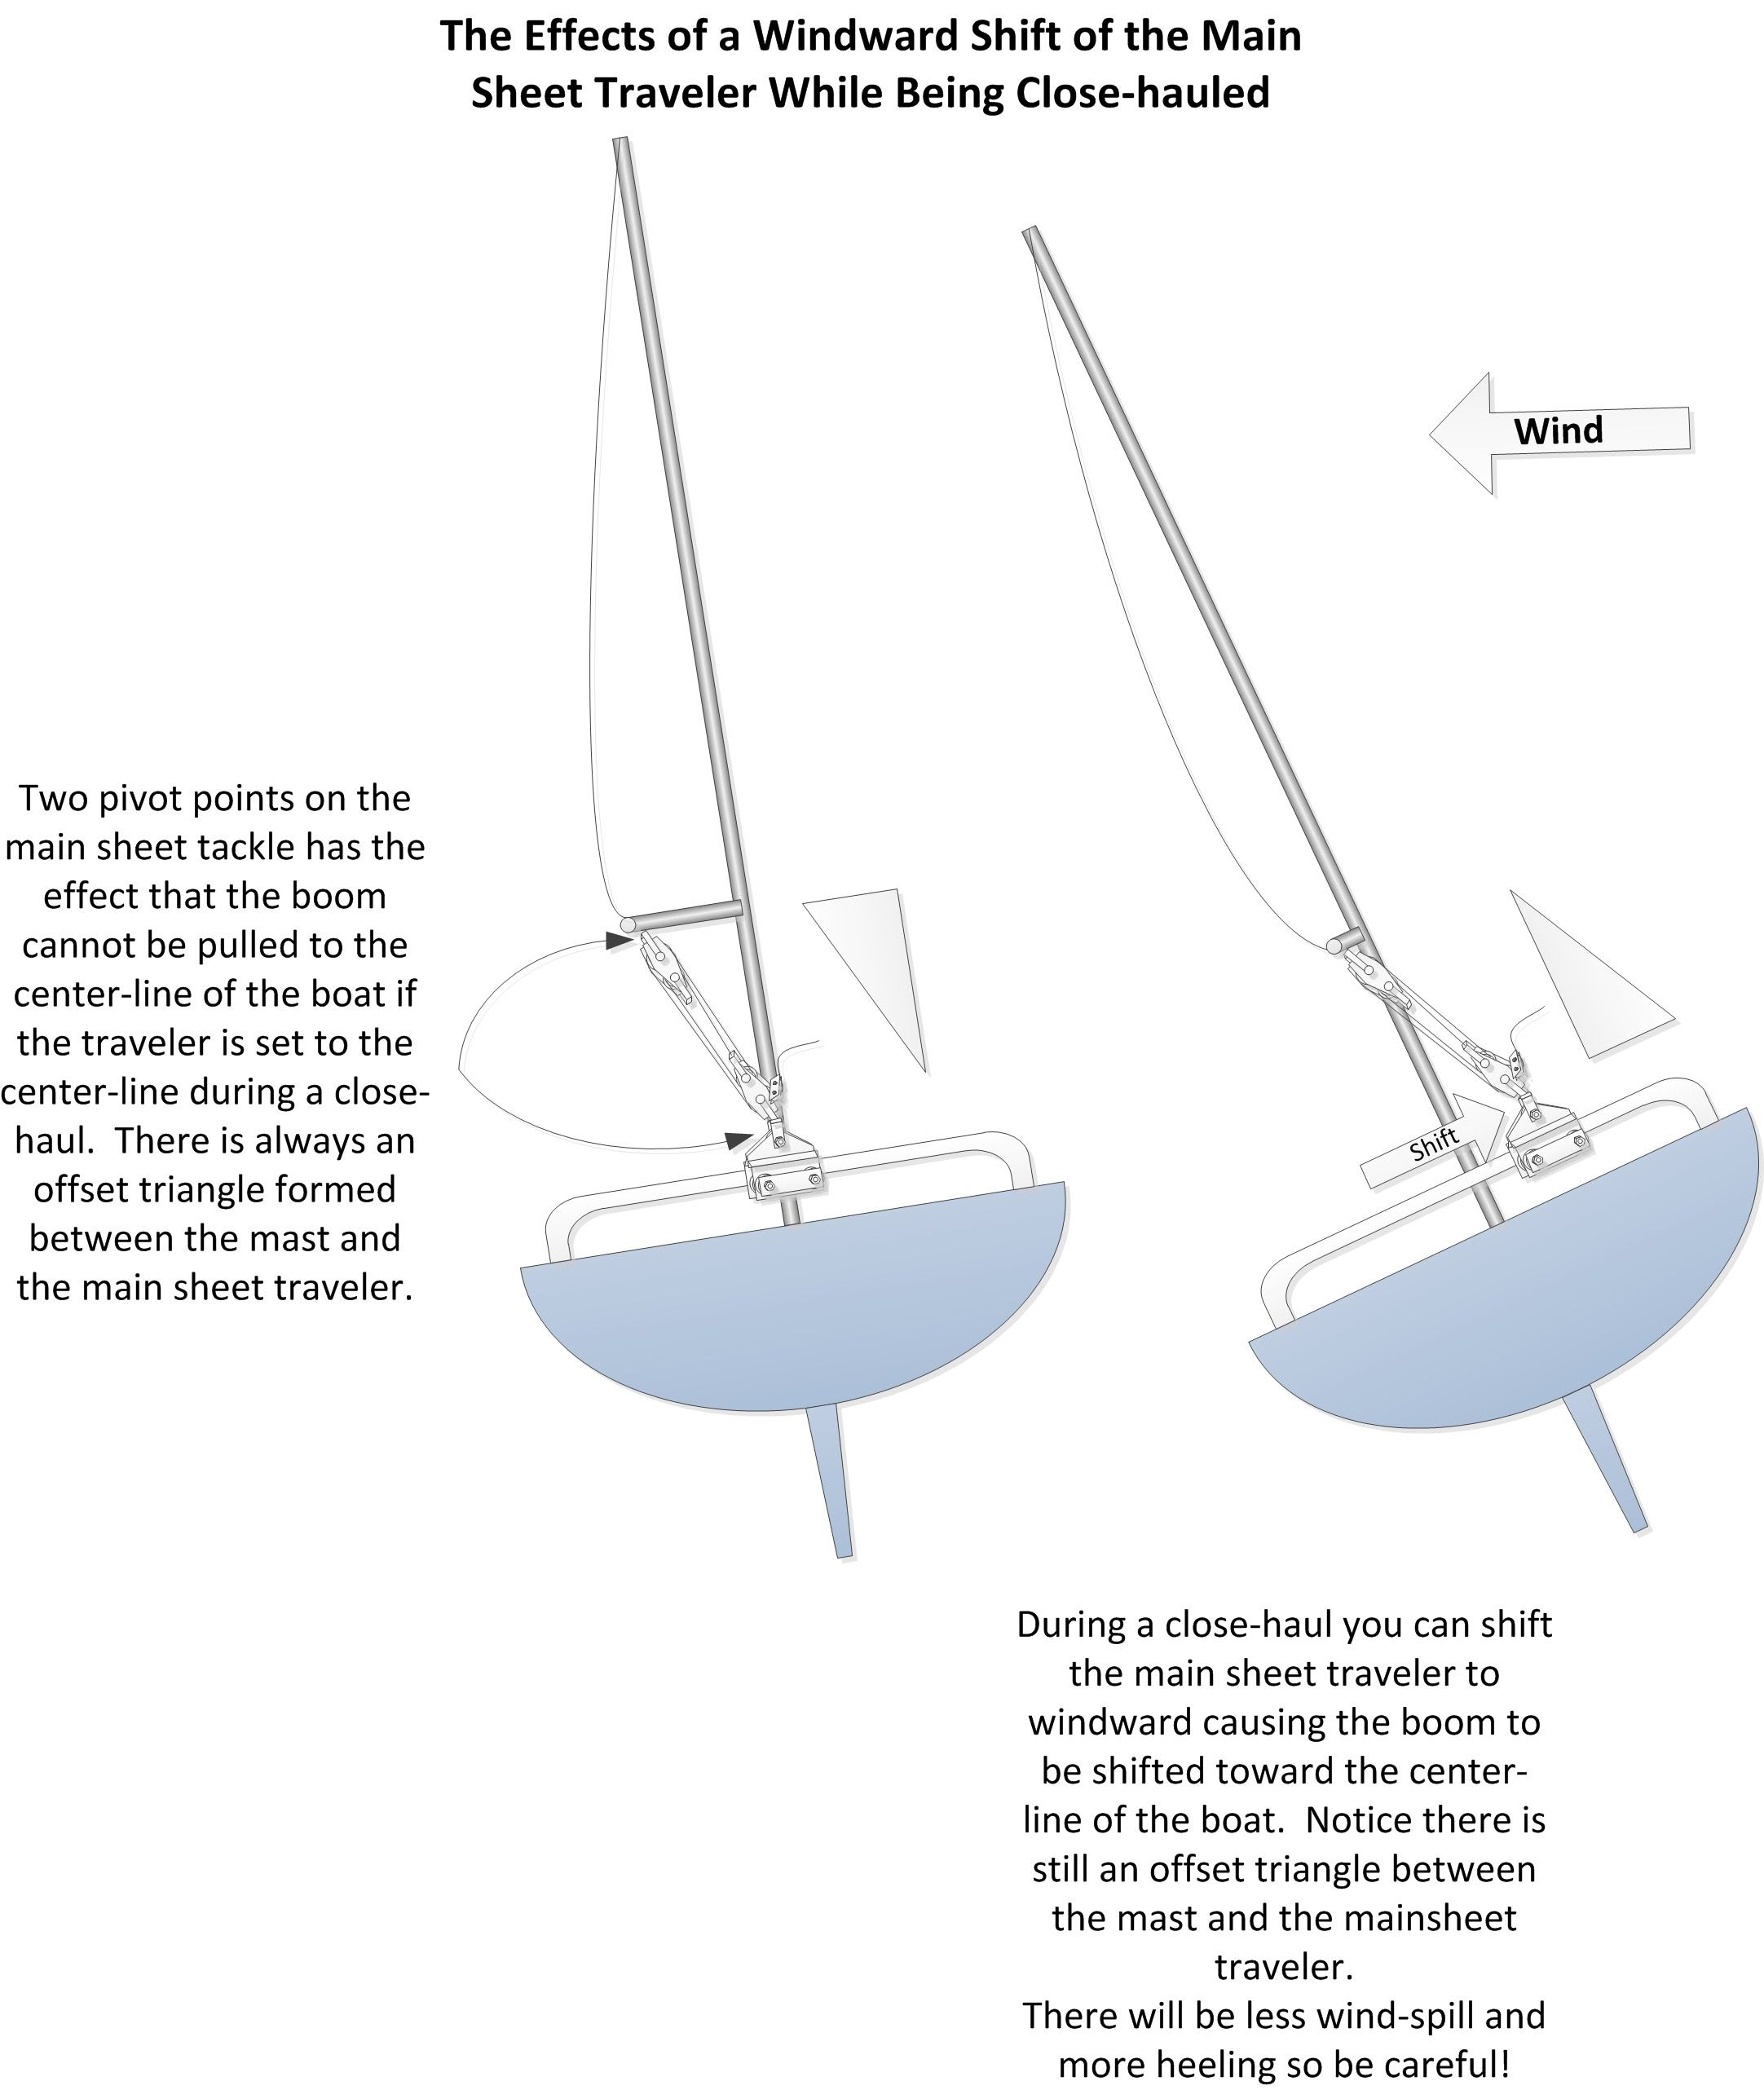 medium resolution of upgrades repairs c22 c 22 catalina 22 sailboat modifications projects catalina rigging maintenance maintaining mast stepping restoring